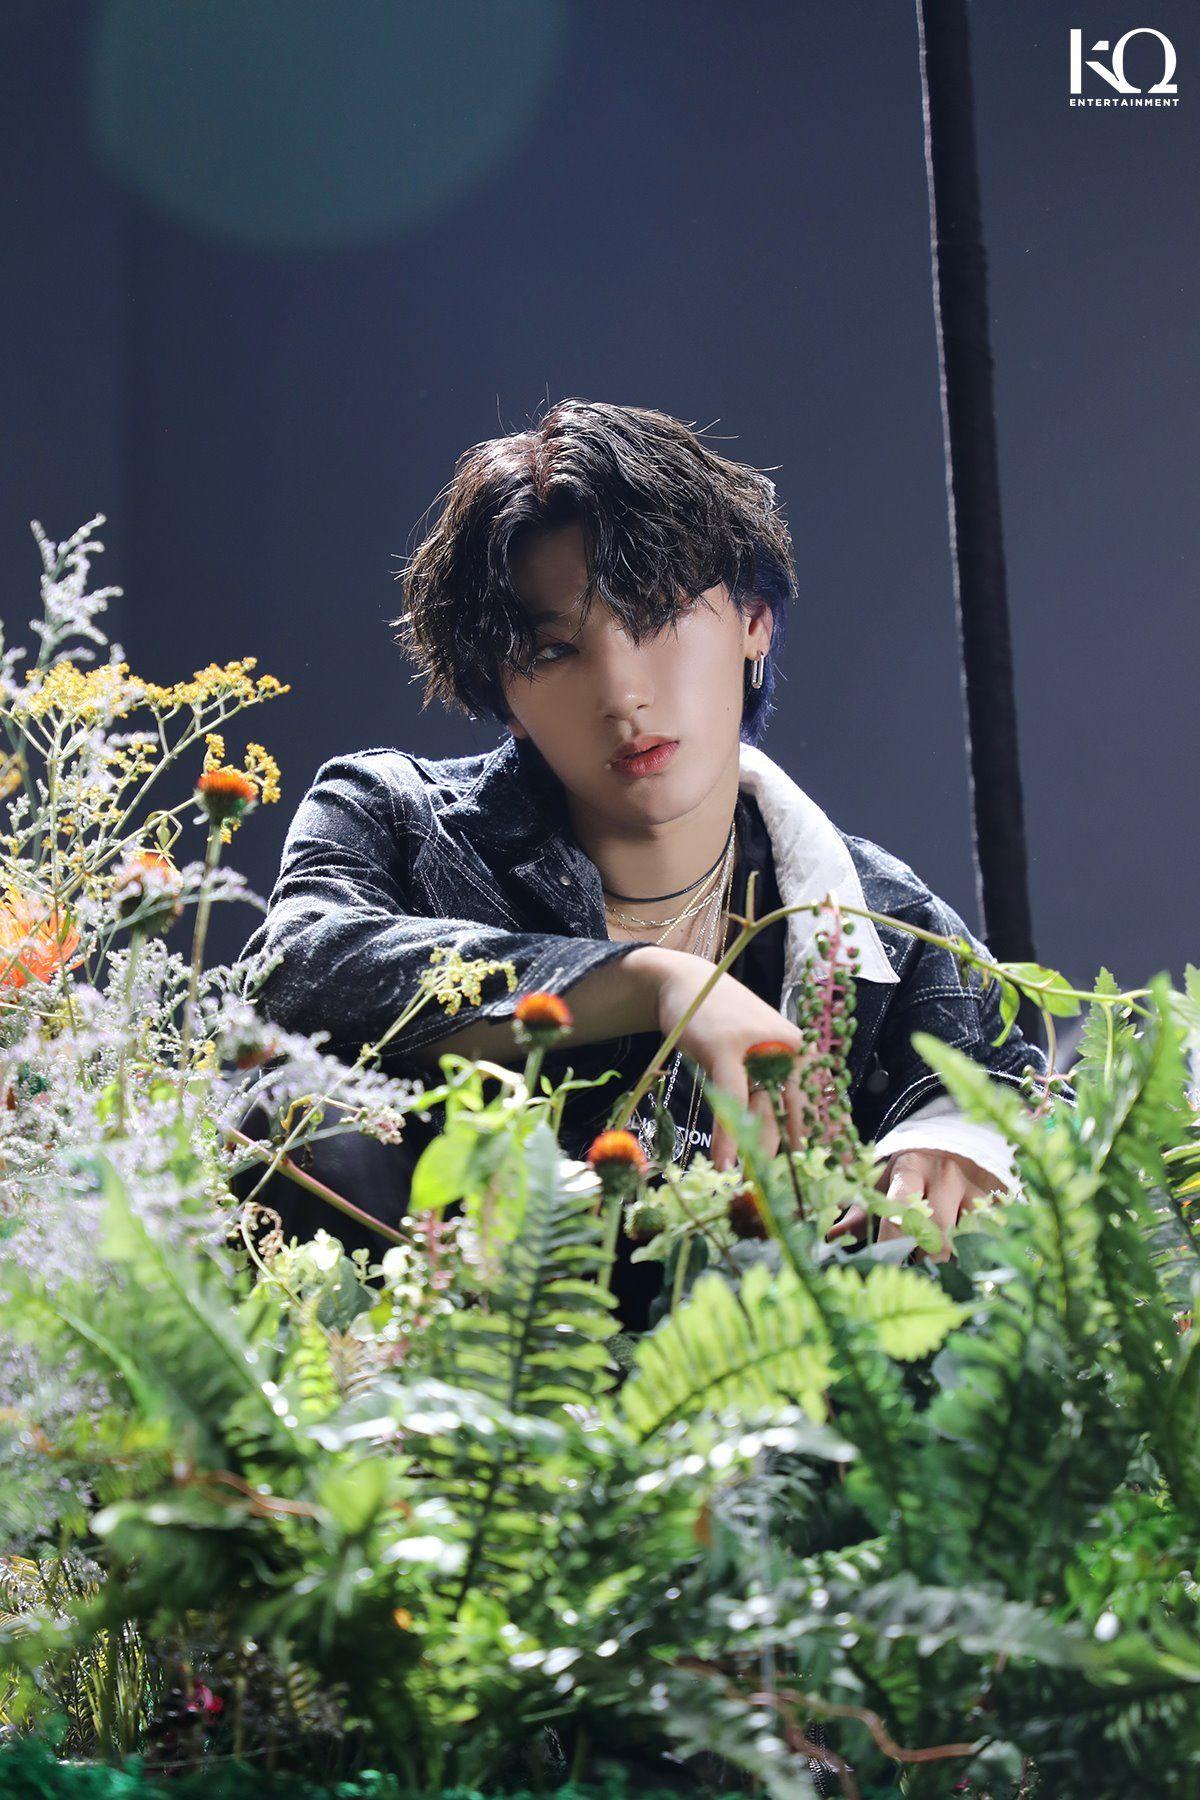 Hye biased San, Woo young, Kpop